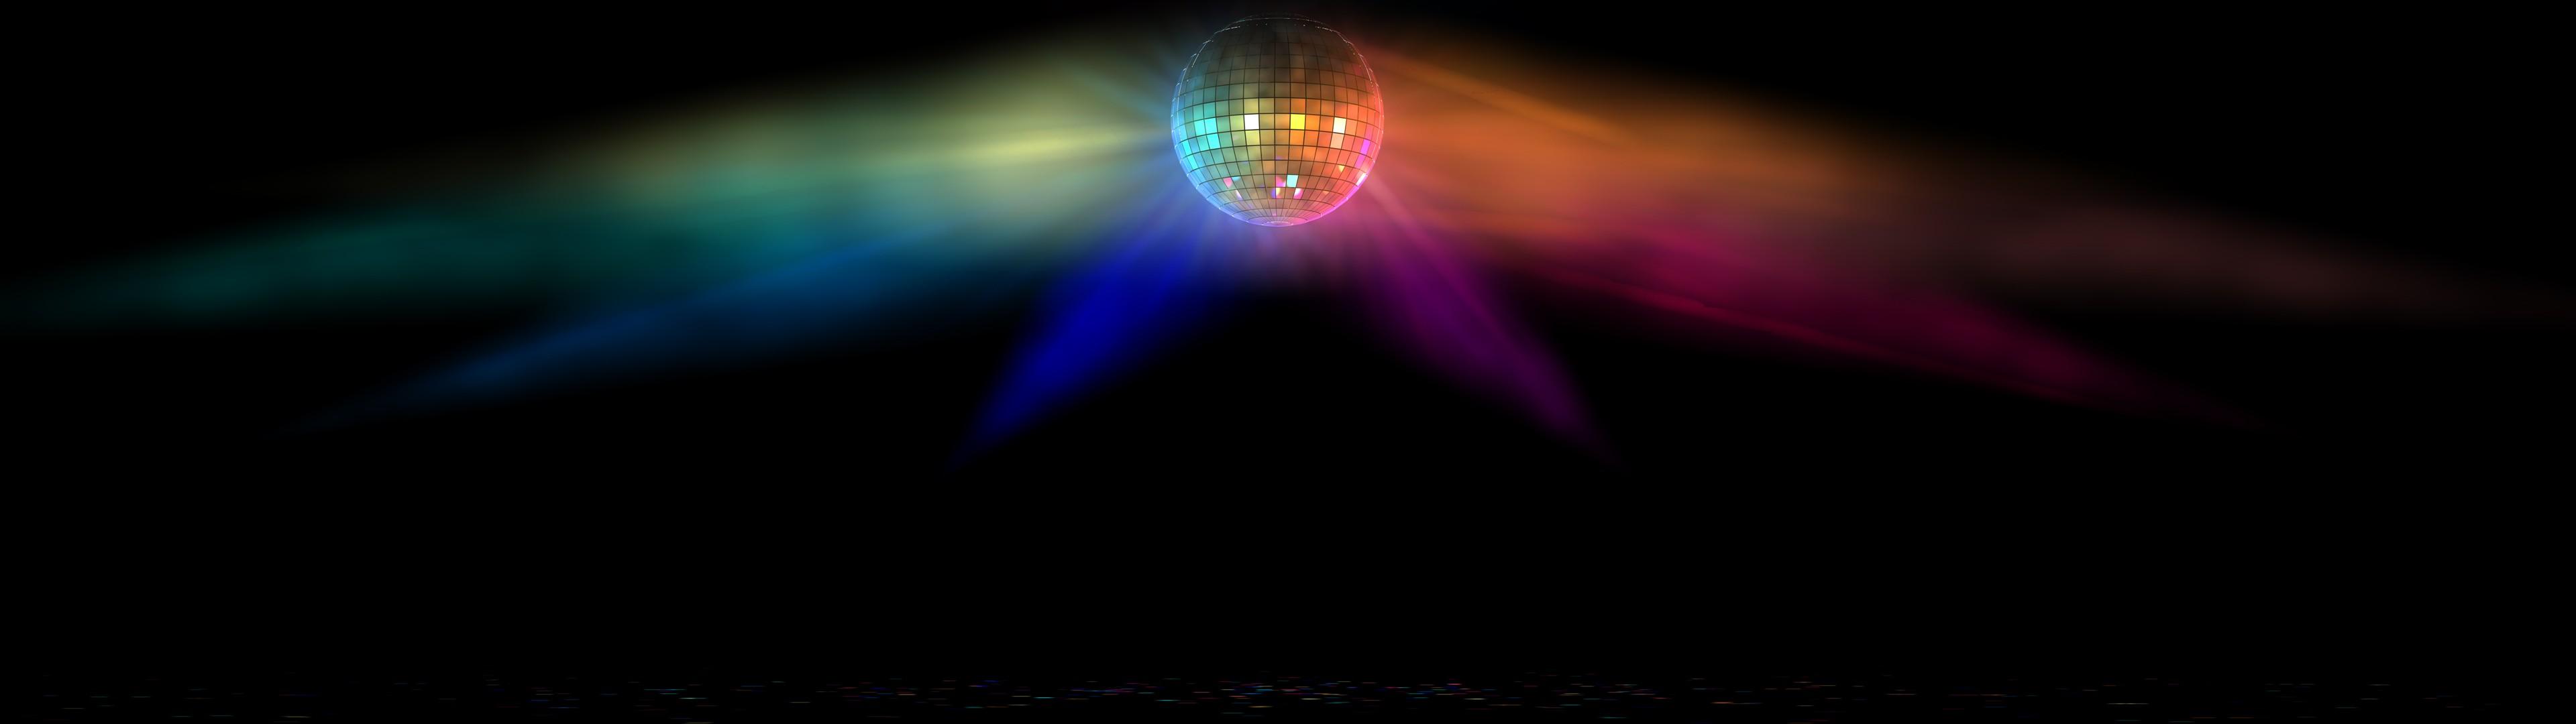 Get Disco Light - Microsoft Store